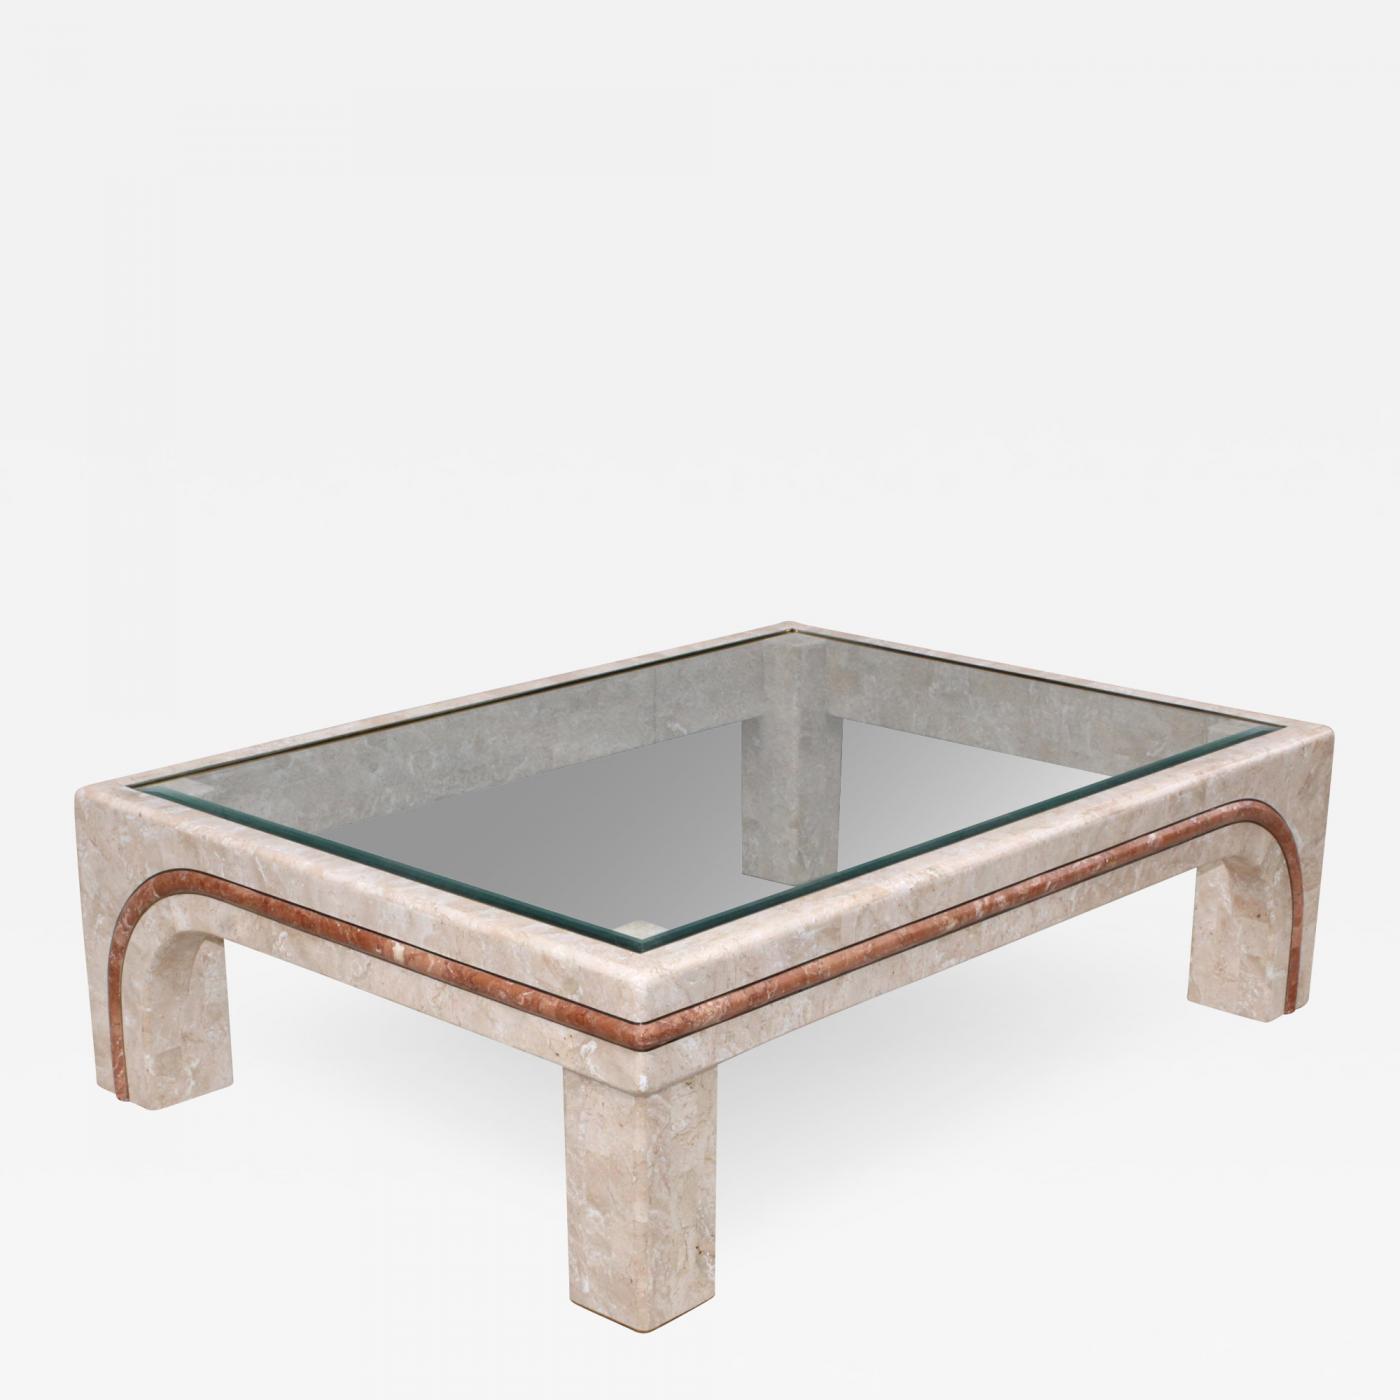 maitland smith overzise tessellated stone coffee table